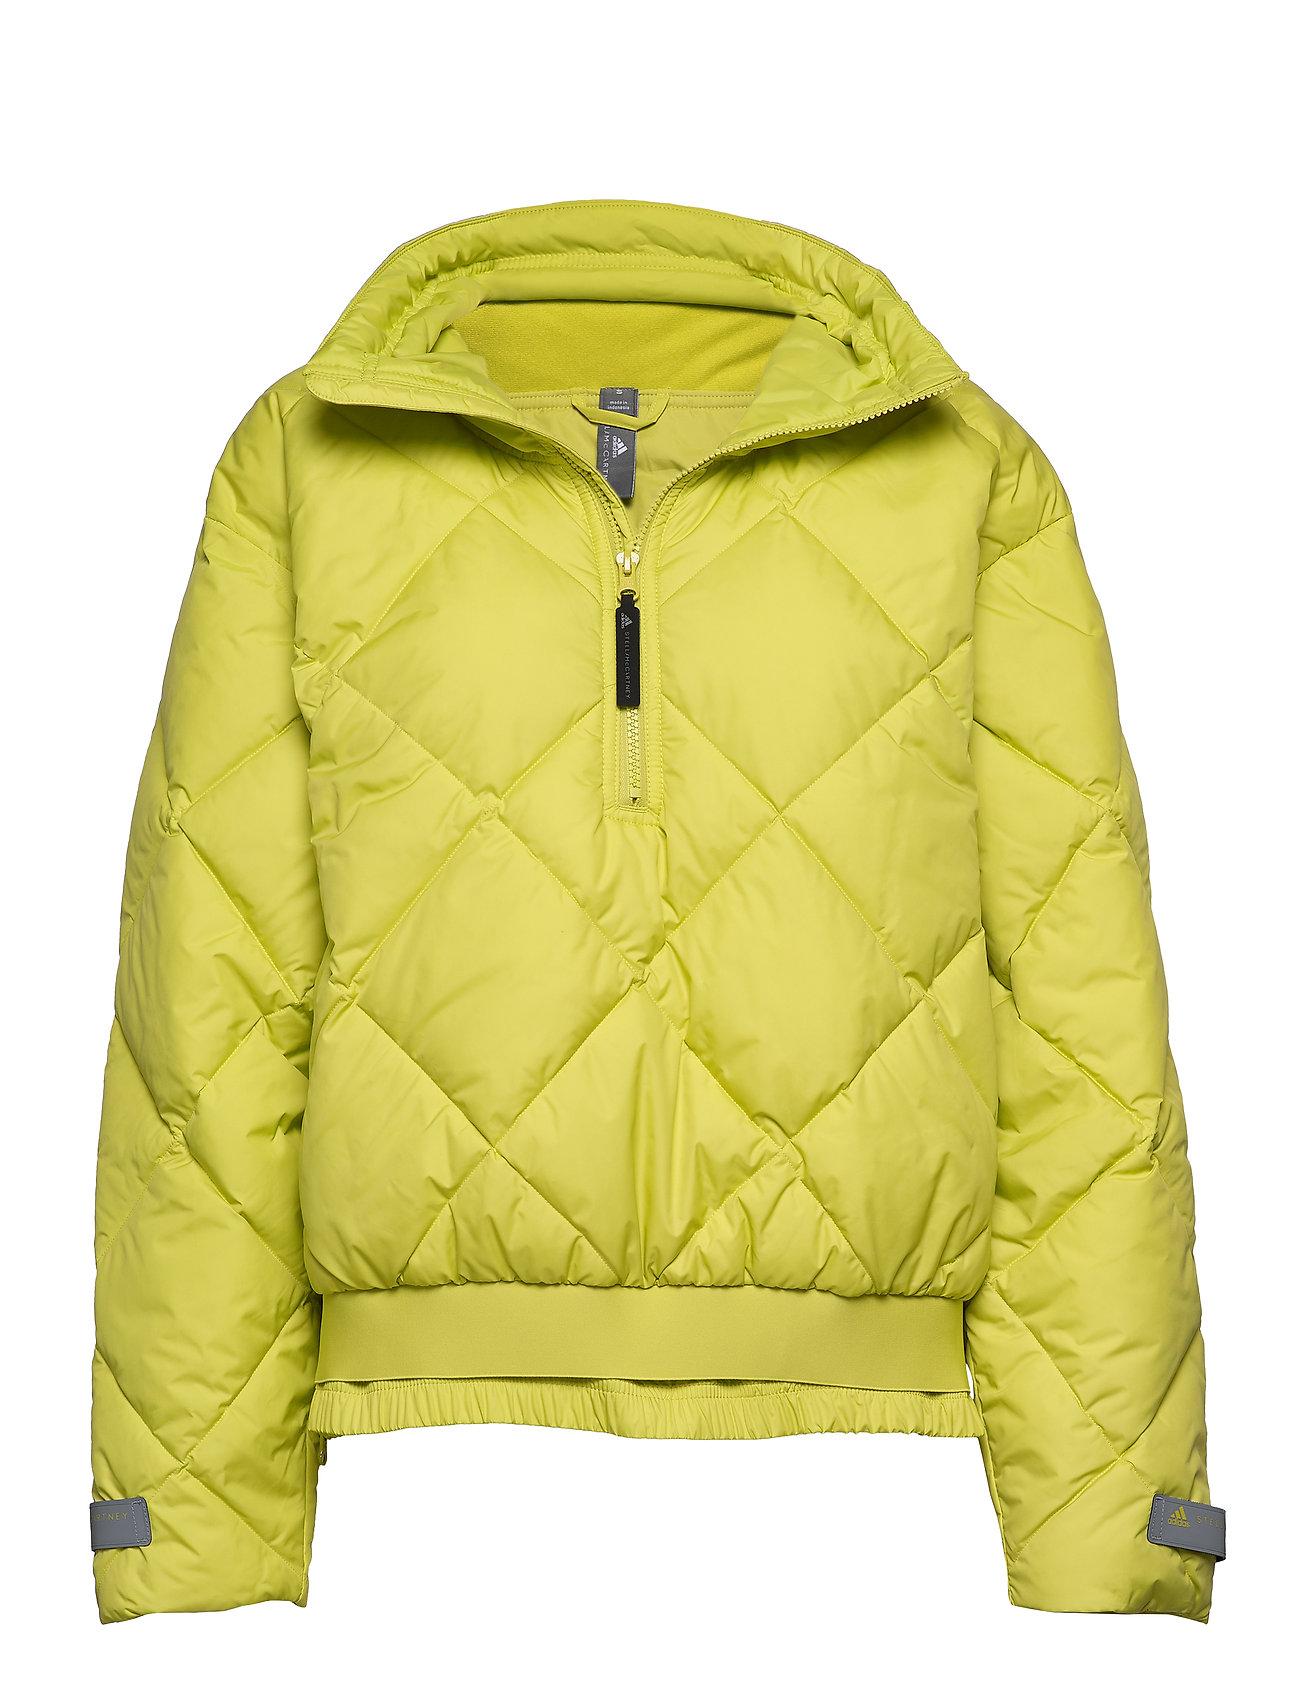 stella mccartney adidas gul jacket